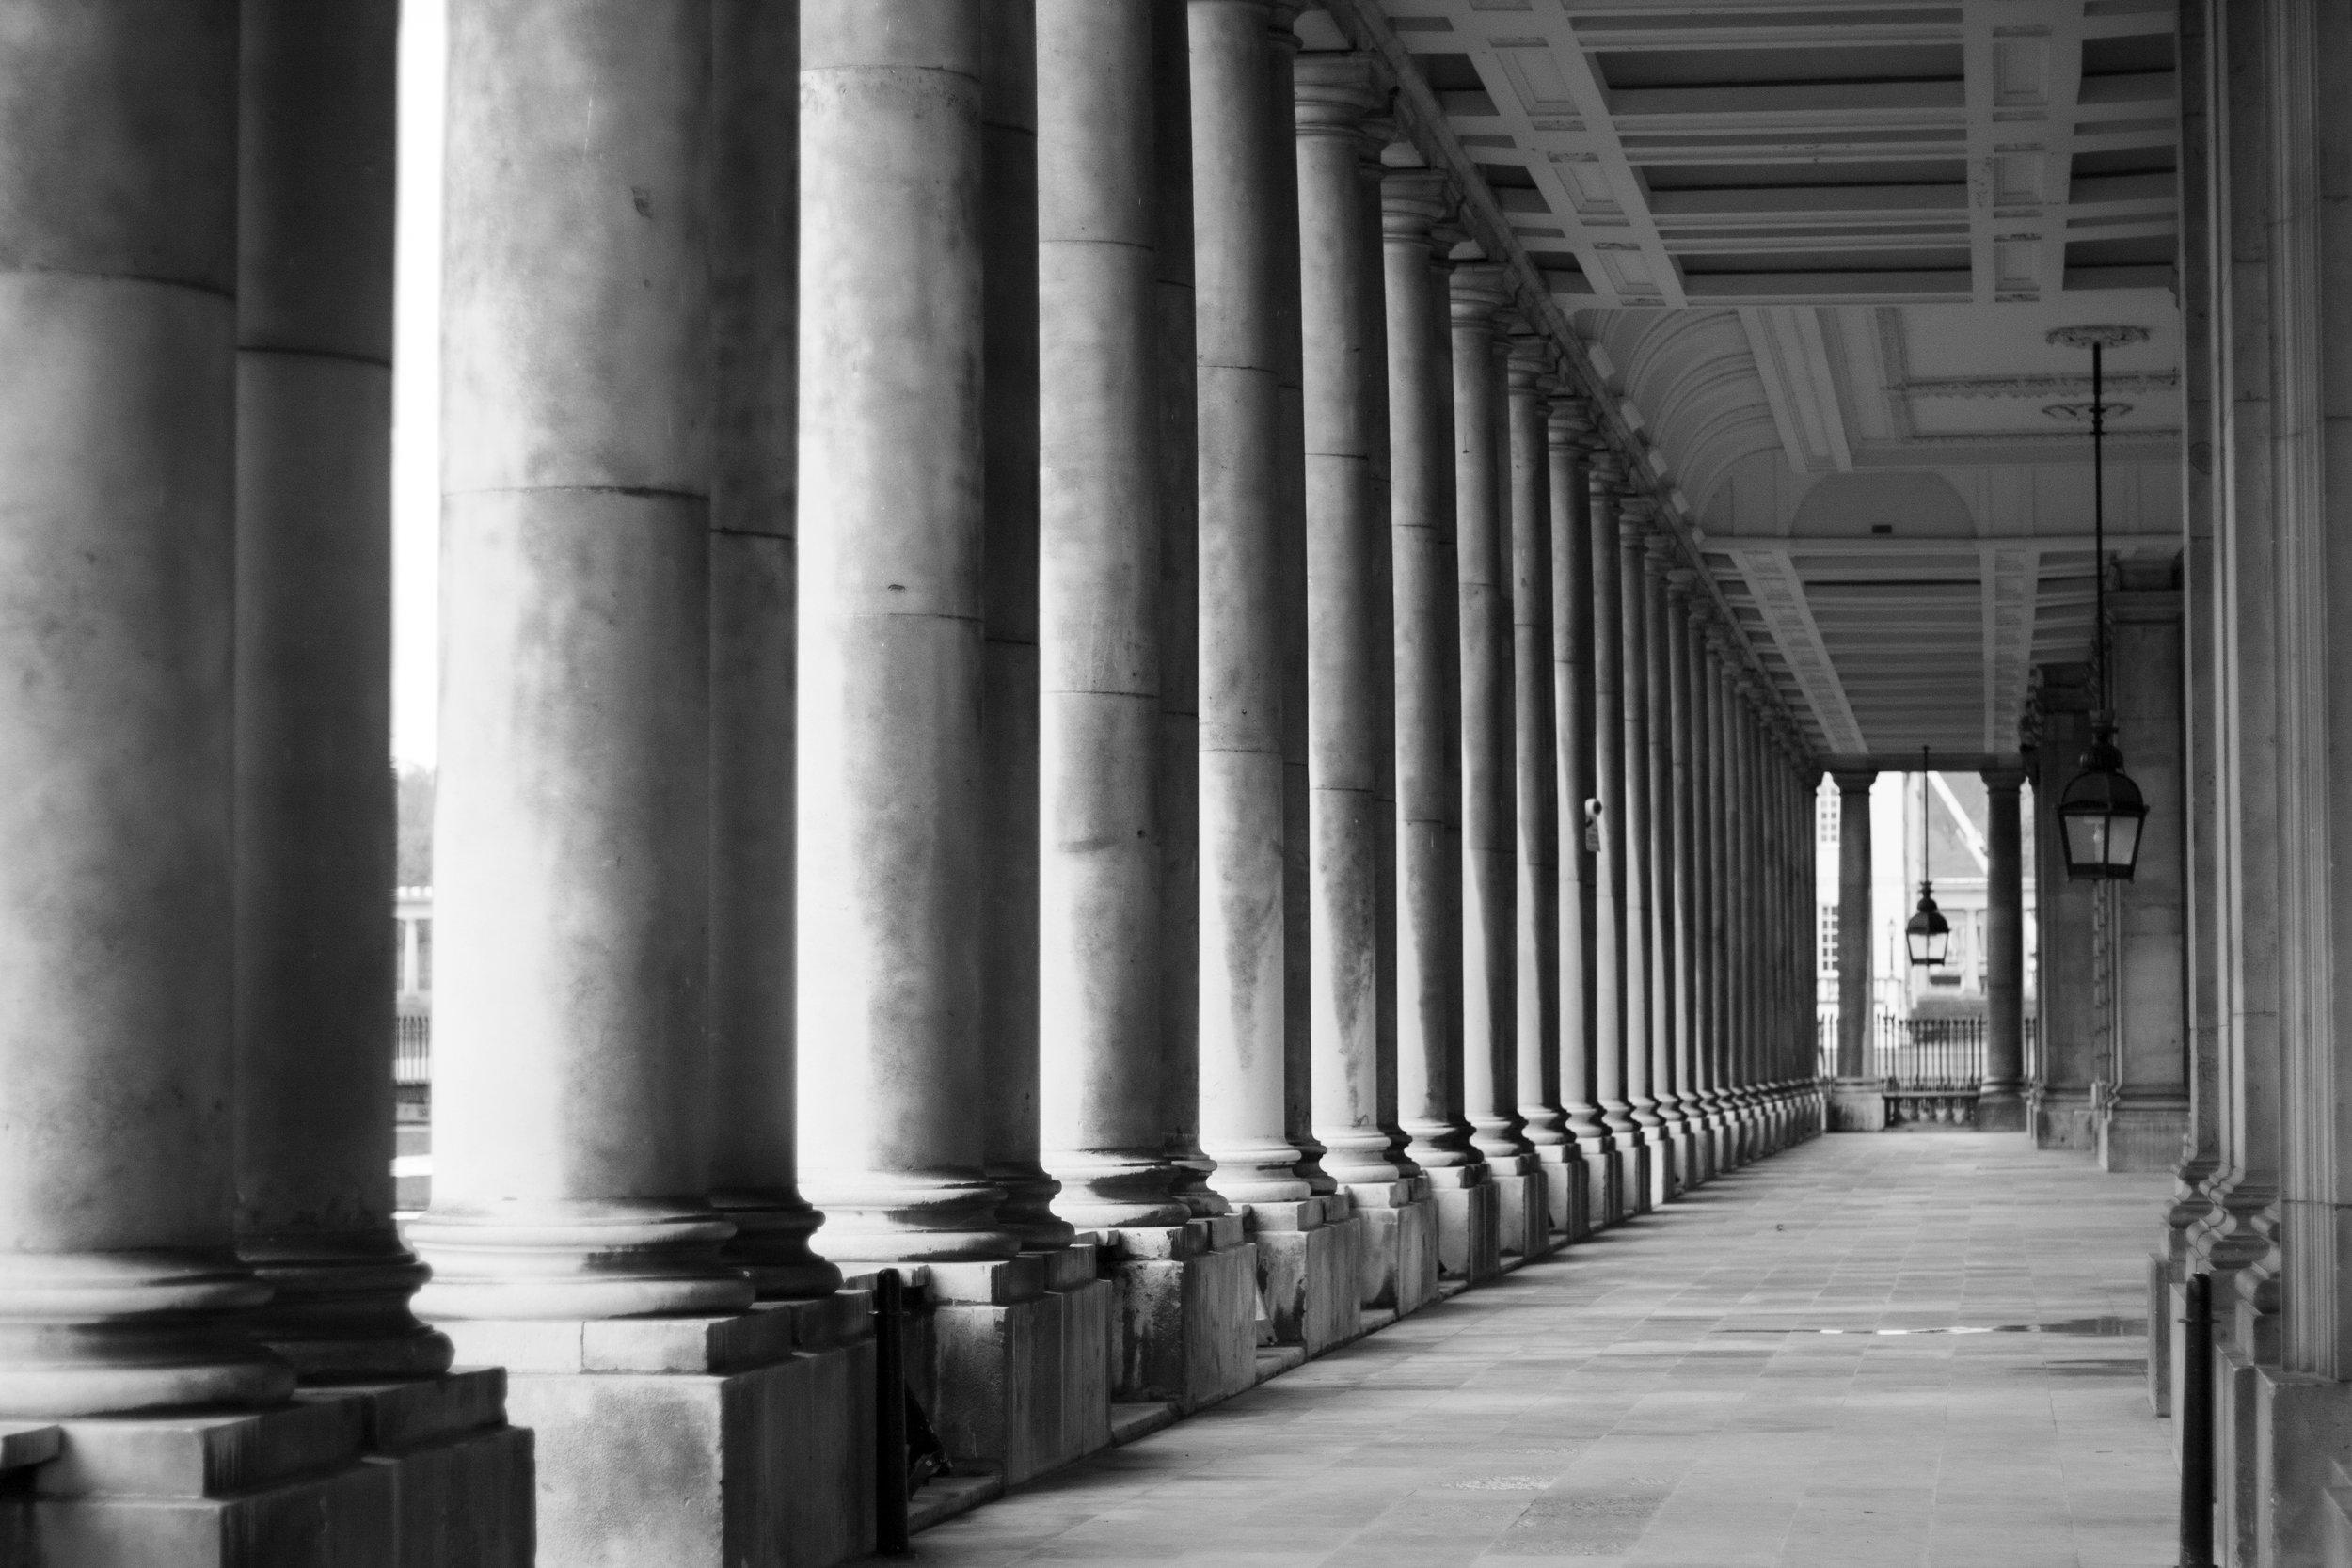 columns_at_cutty_sark.jpg